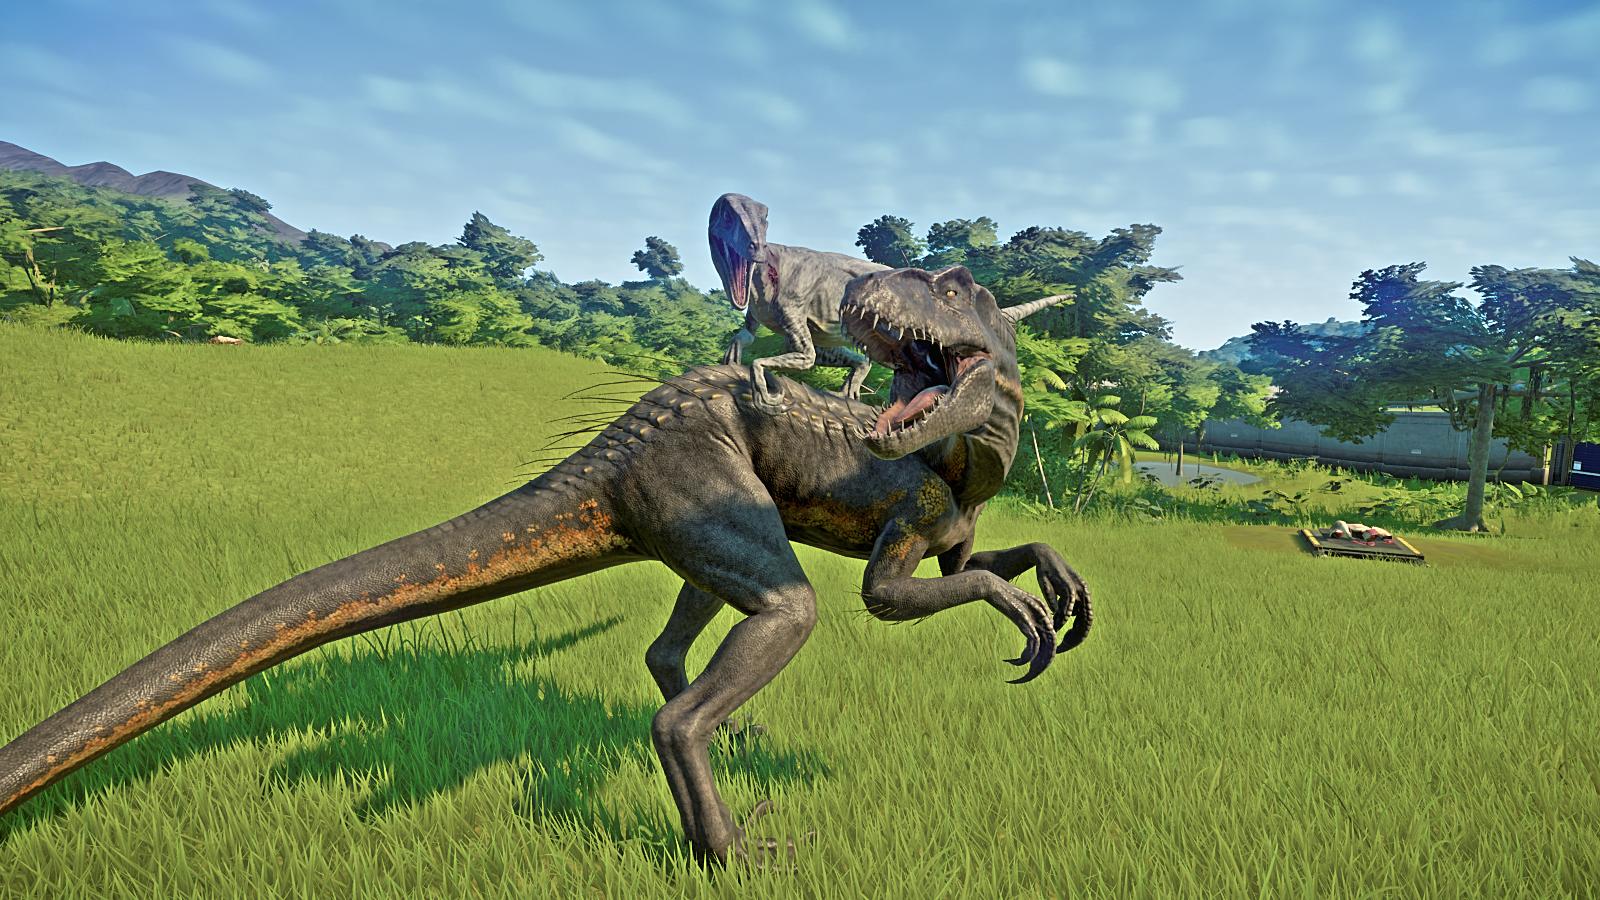 Jurassic World · Evolutionary Dinosaurs Jurassic world